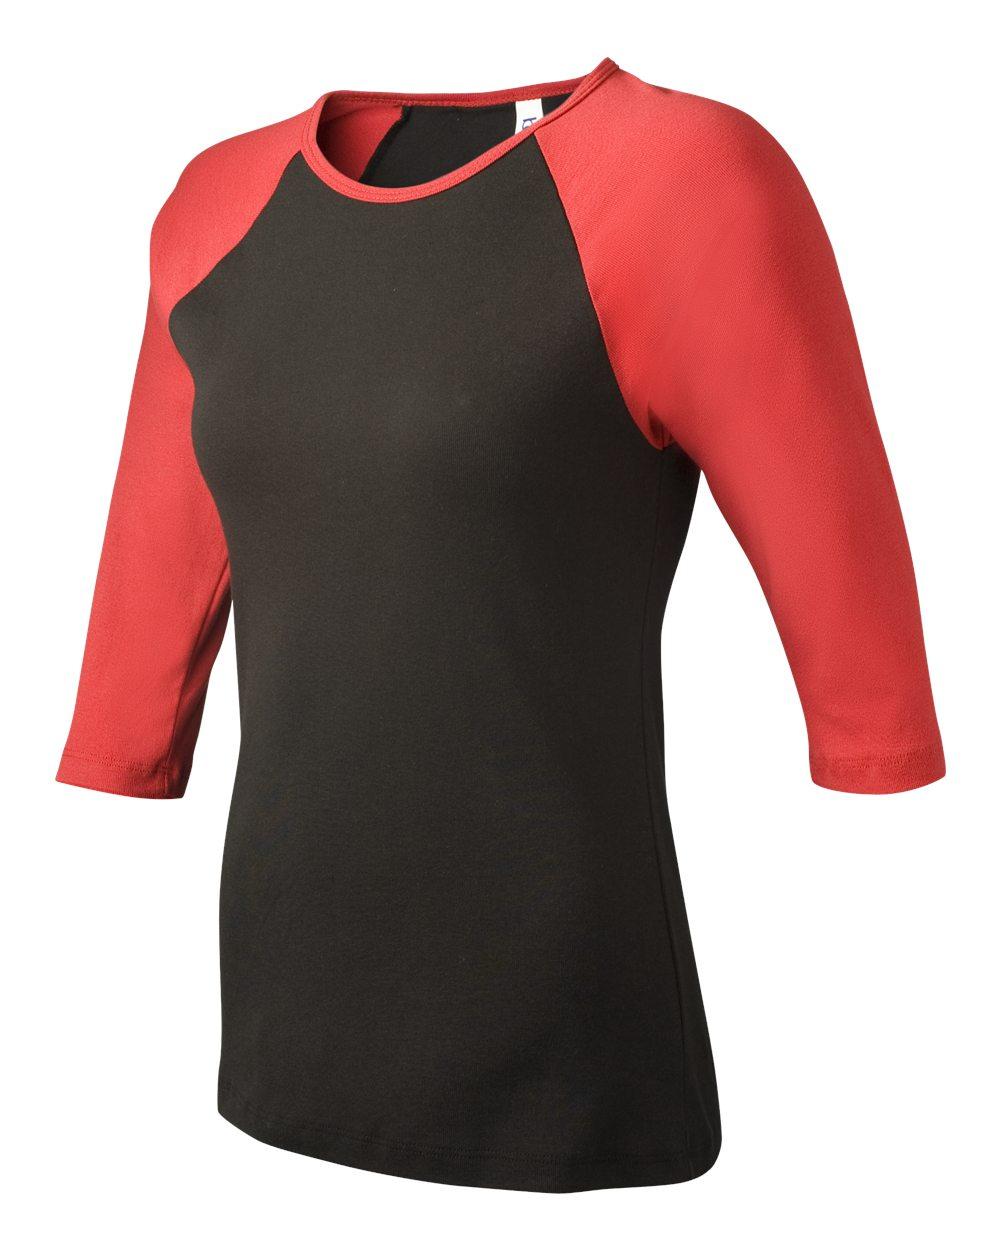 Bella-Canvas-Womens-Stretch-Rib-3-4-Sleeve-Contrast-Raglan-T-Shirt-B2000 thumbnail 7